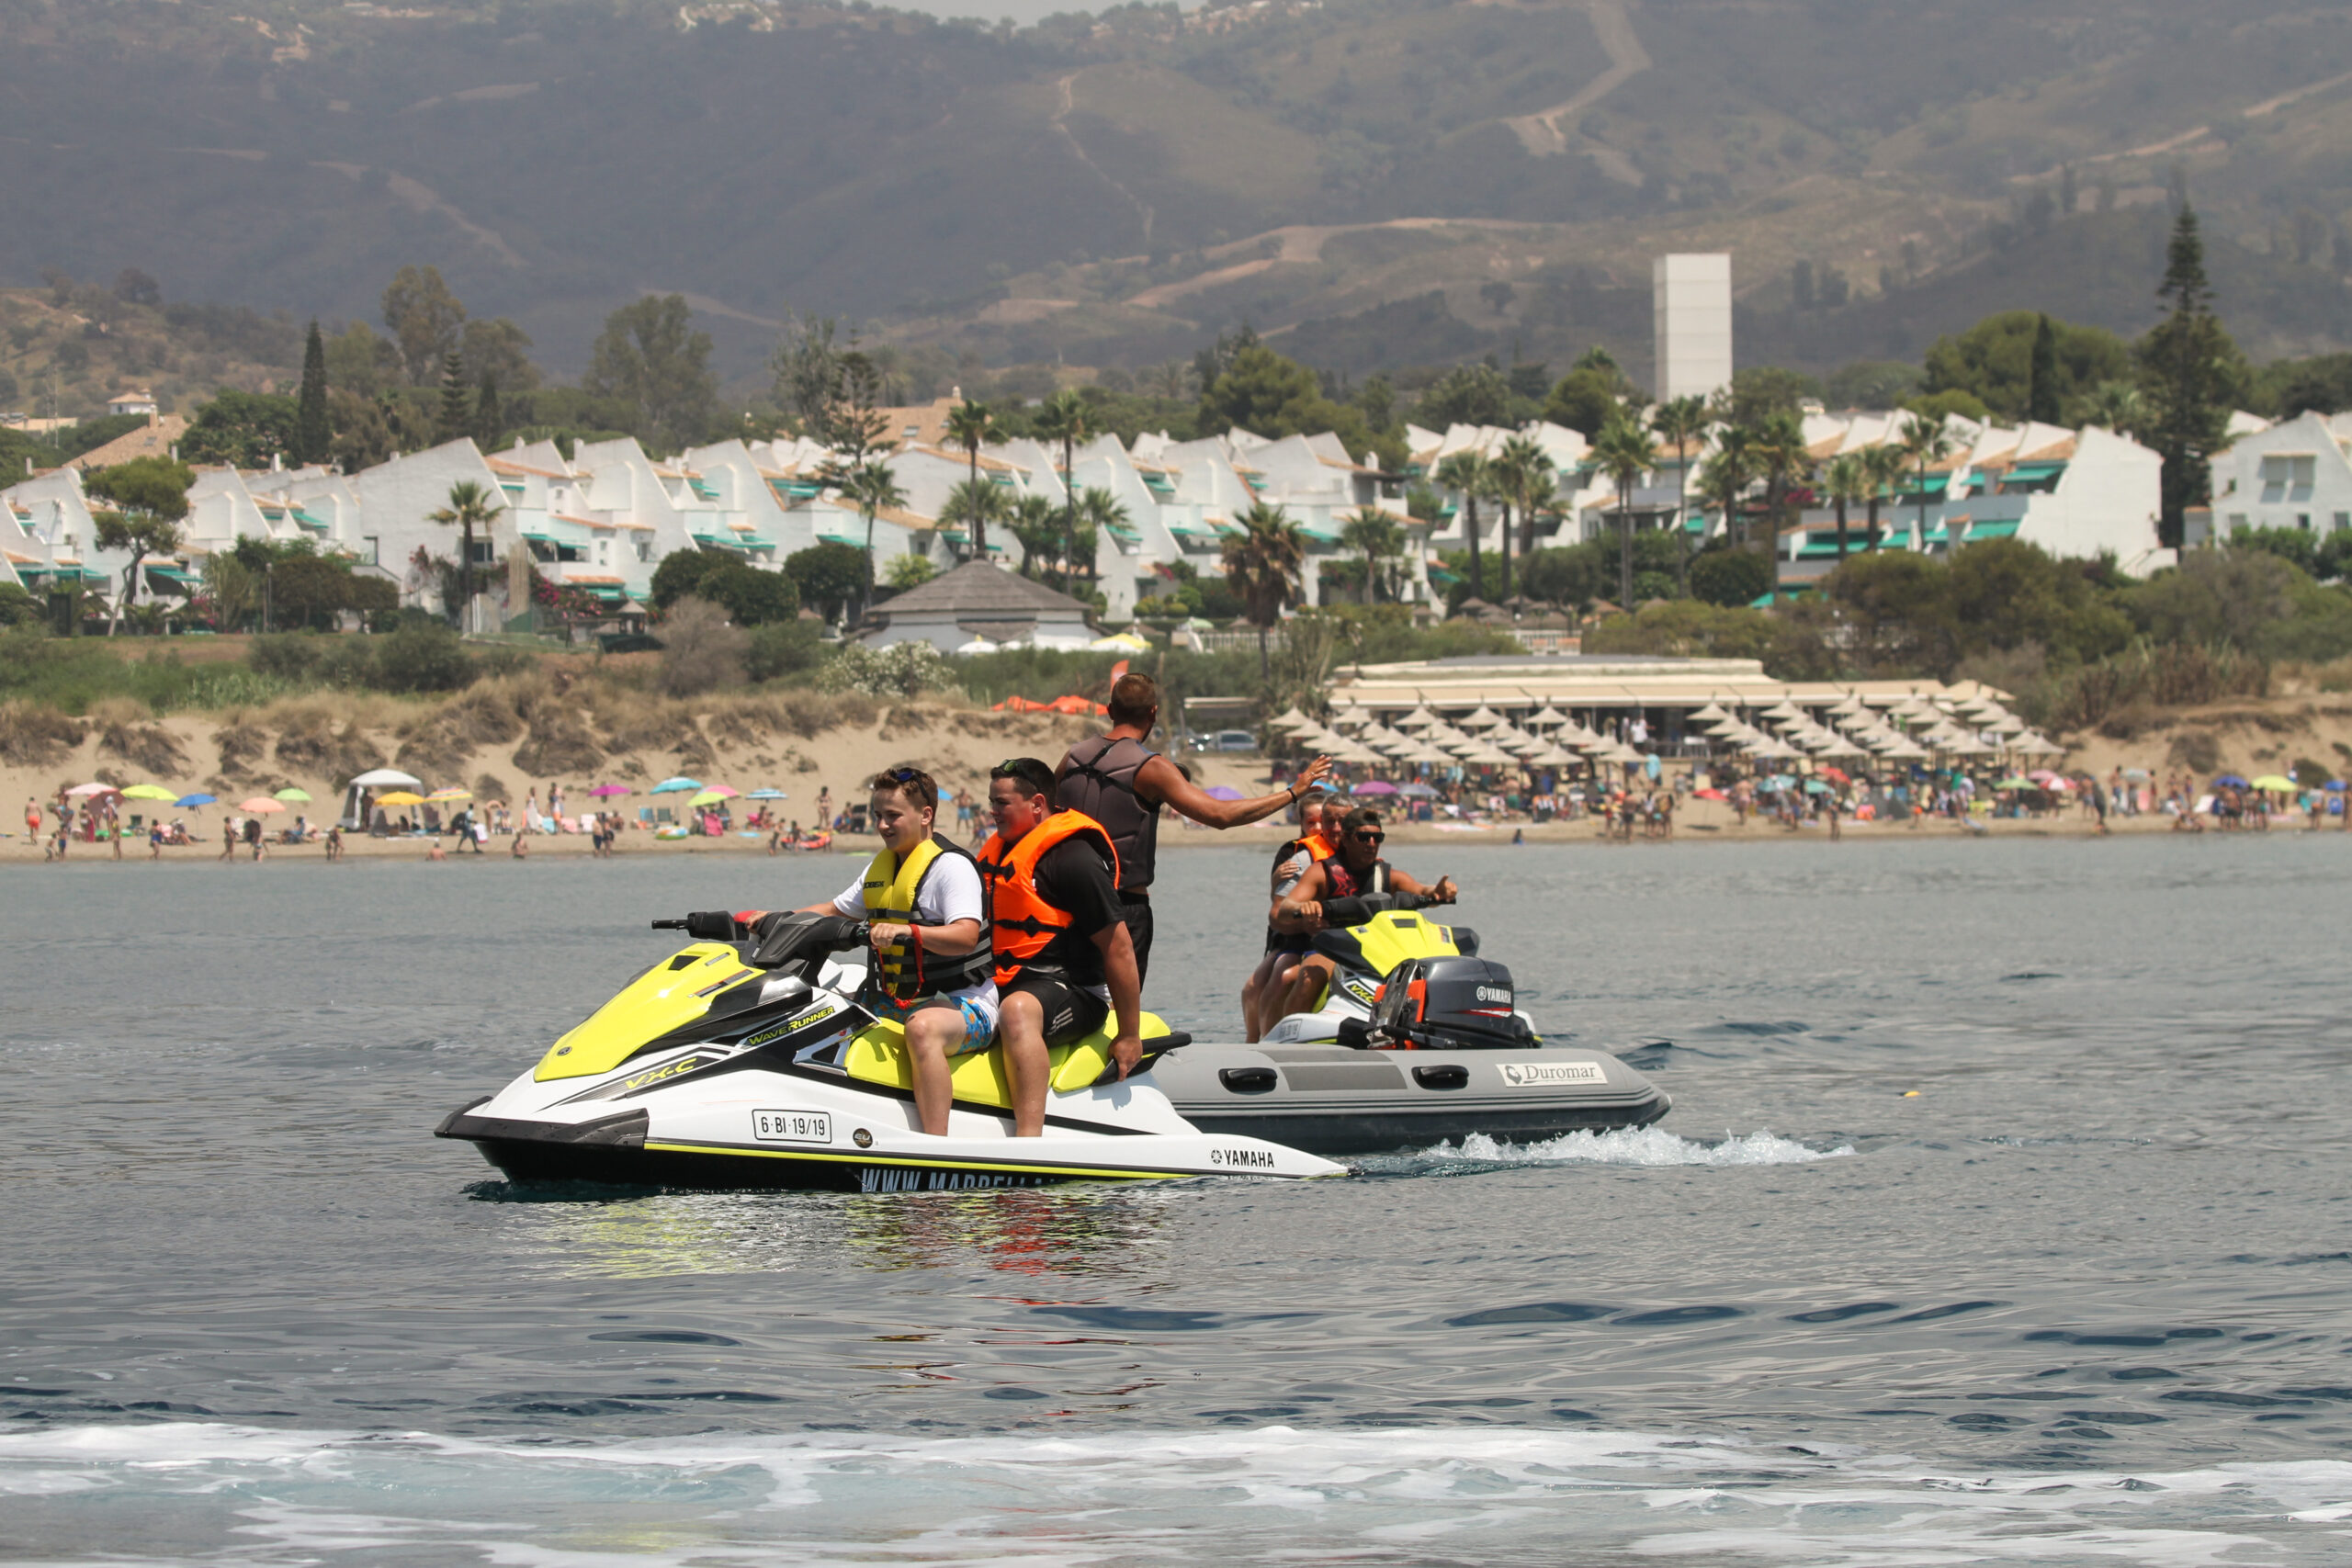 Marbella Jet Ski